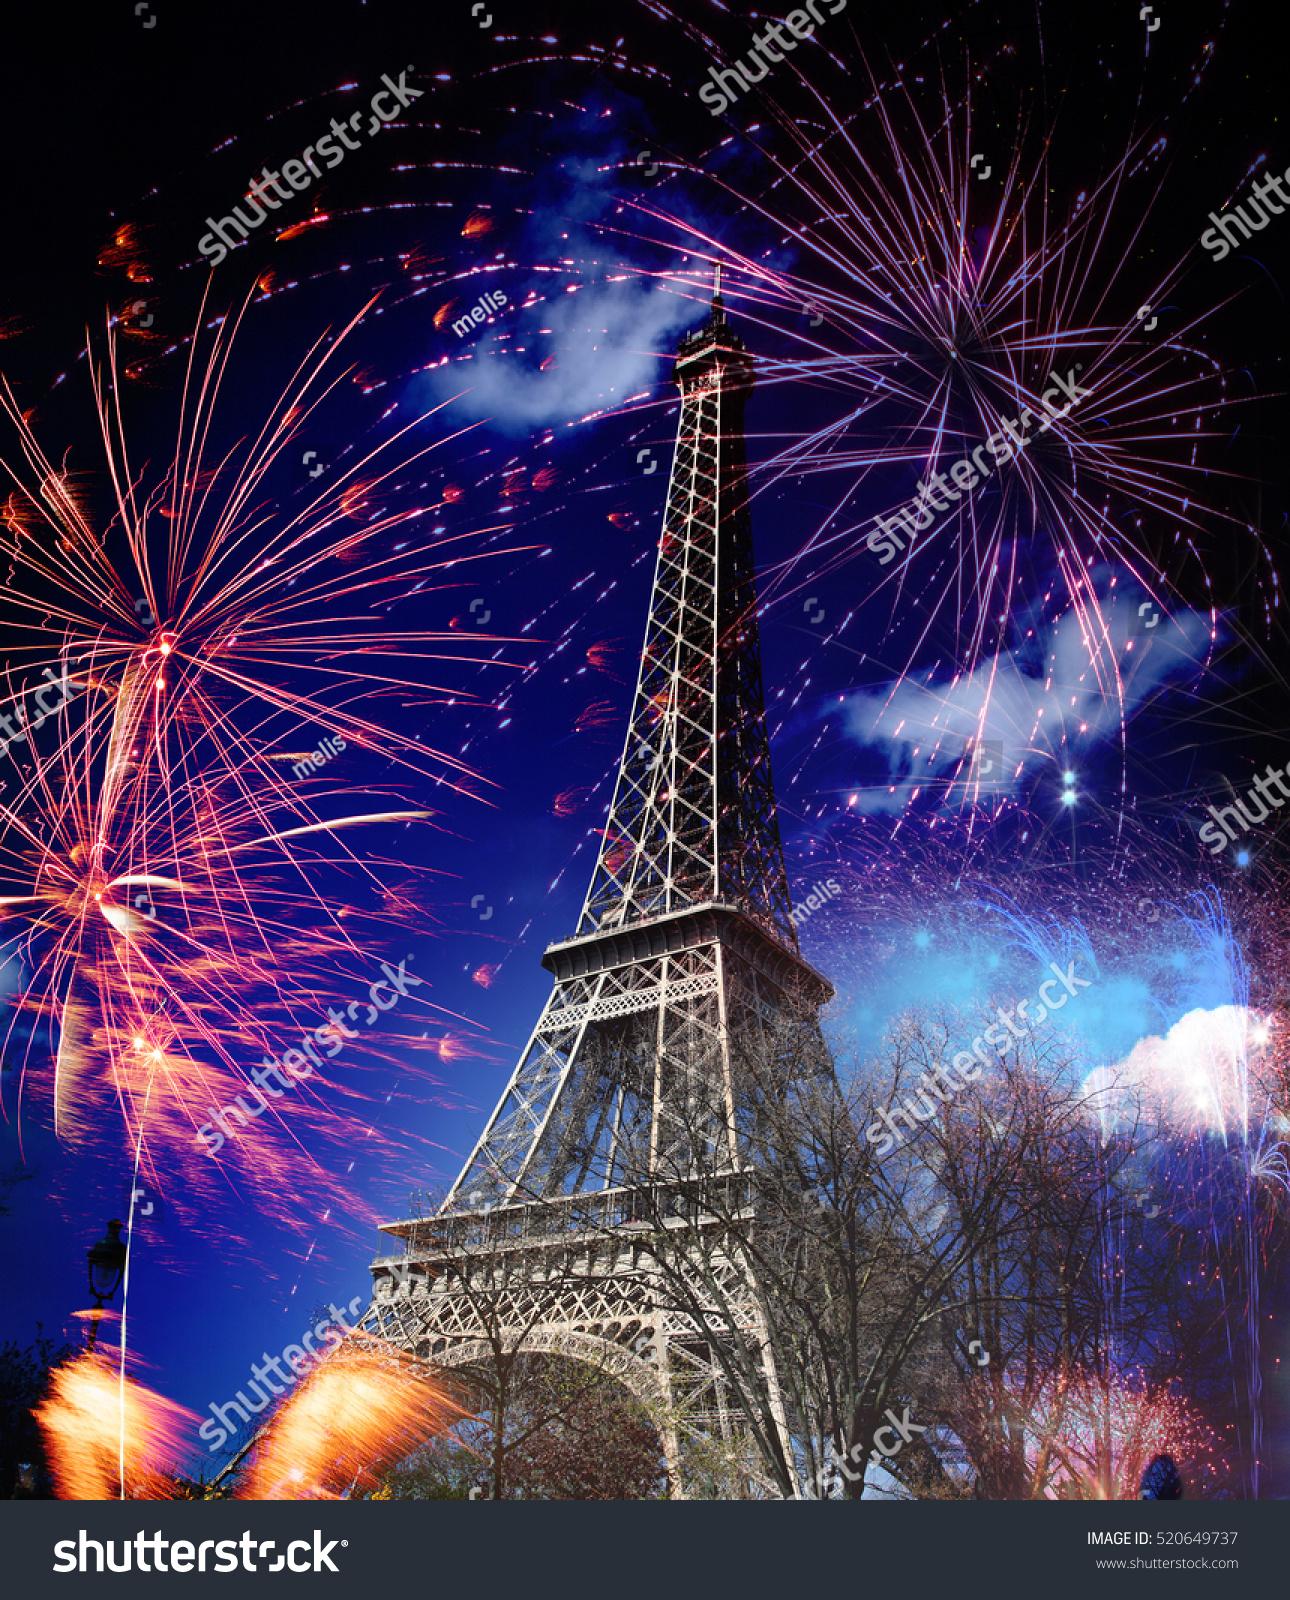 celebrating new year city eiffel tower stock photo (100% legal